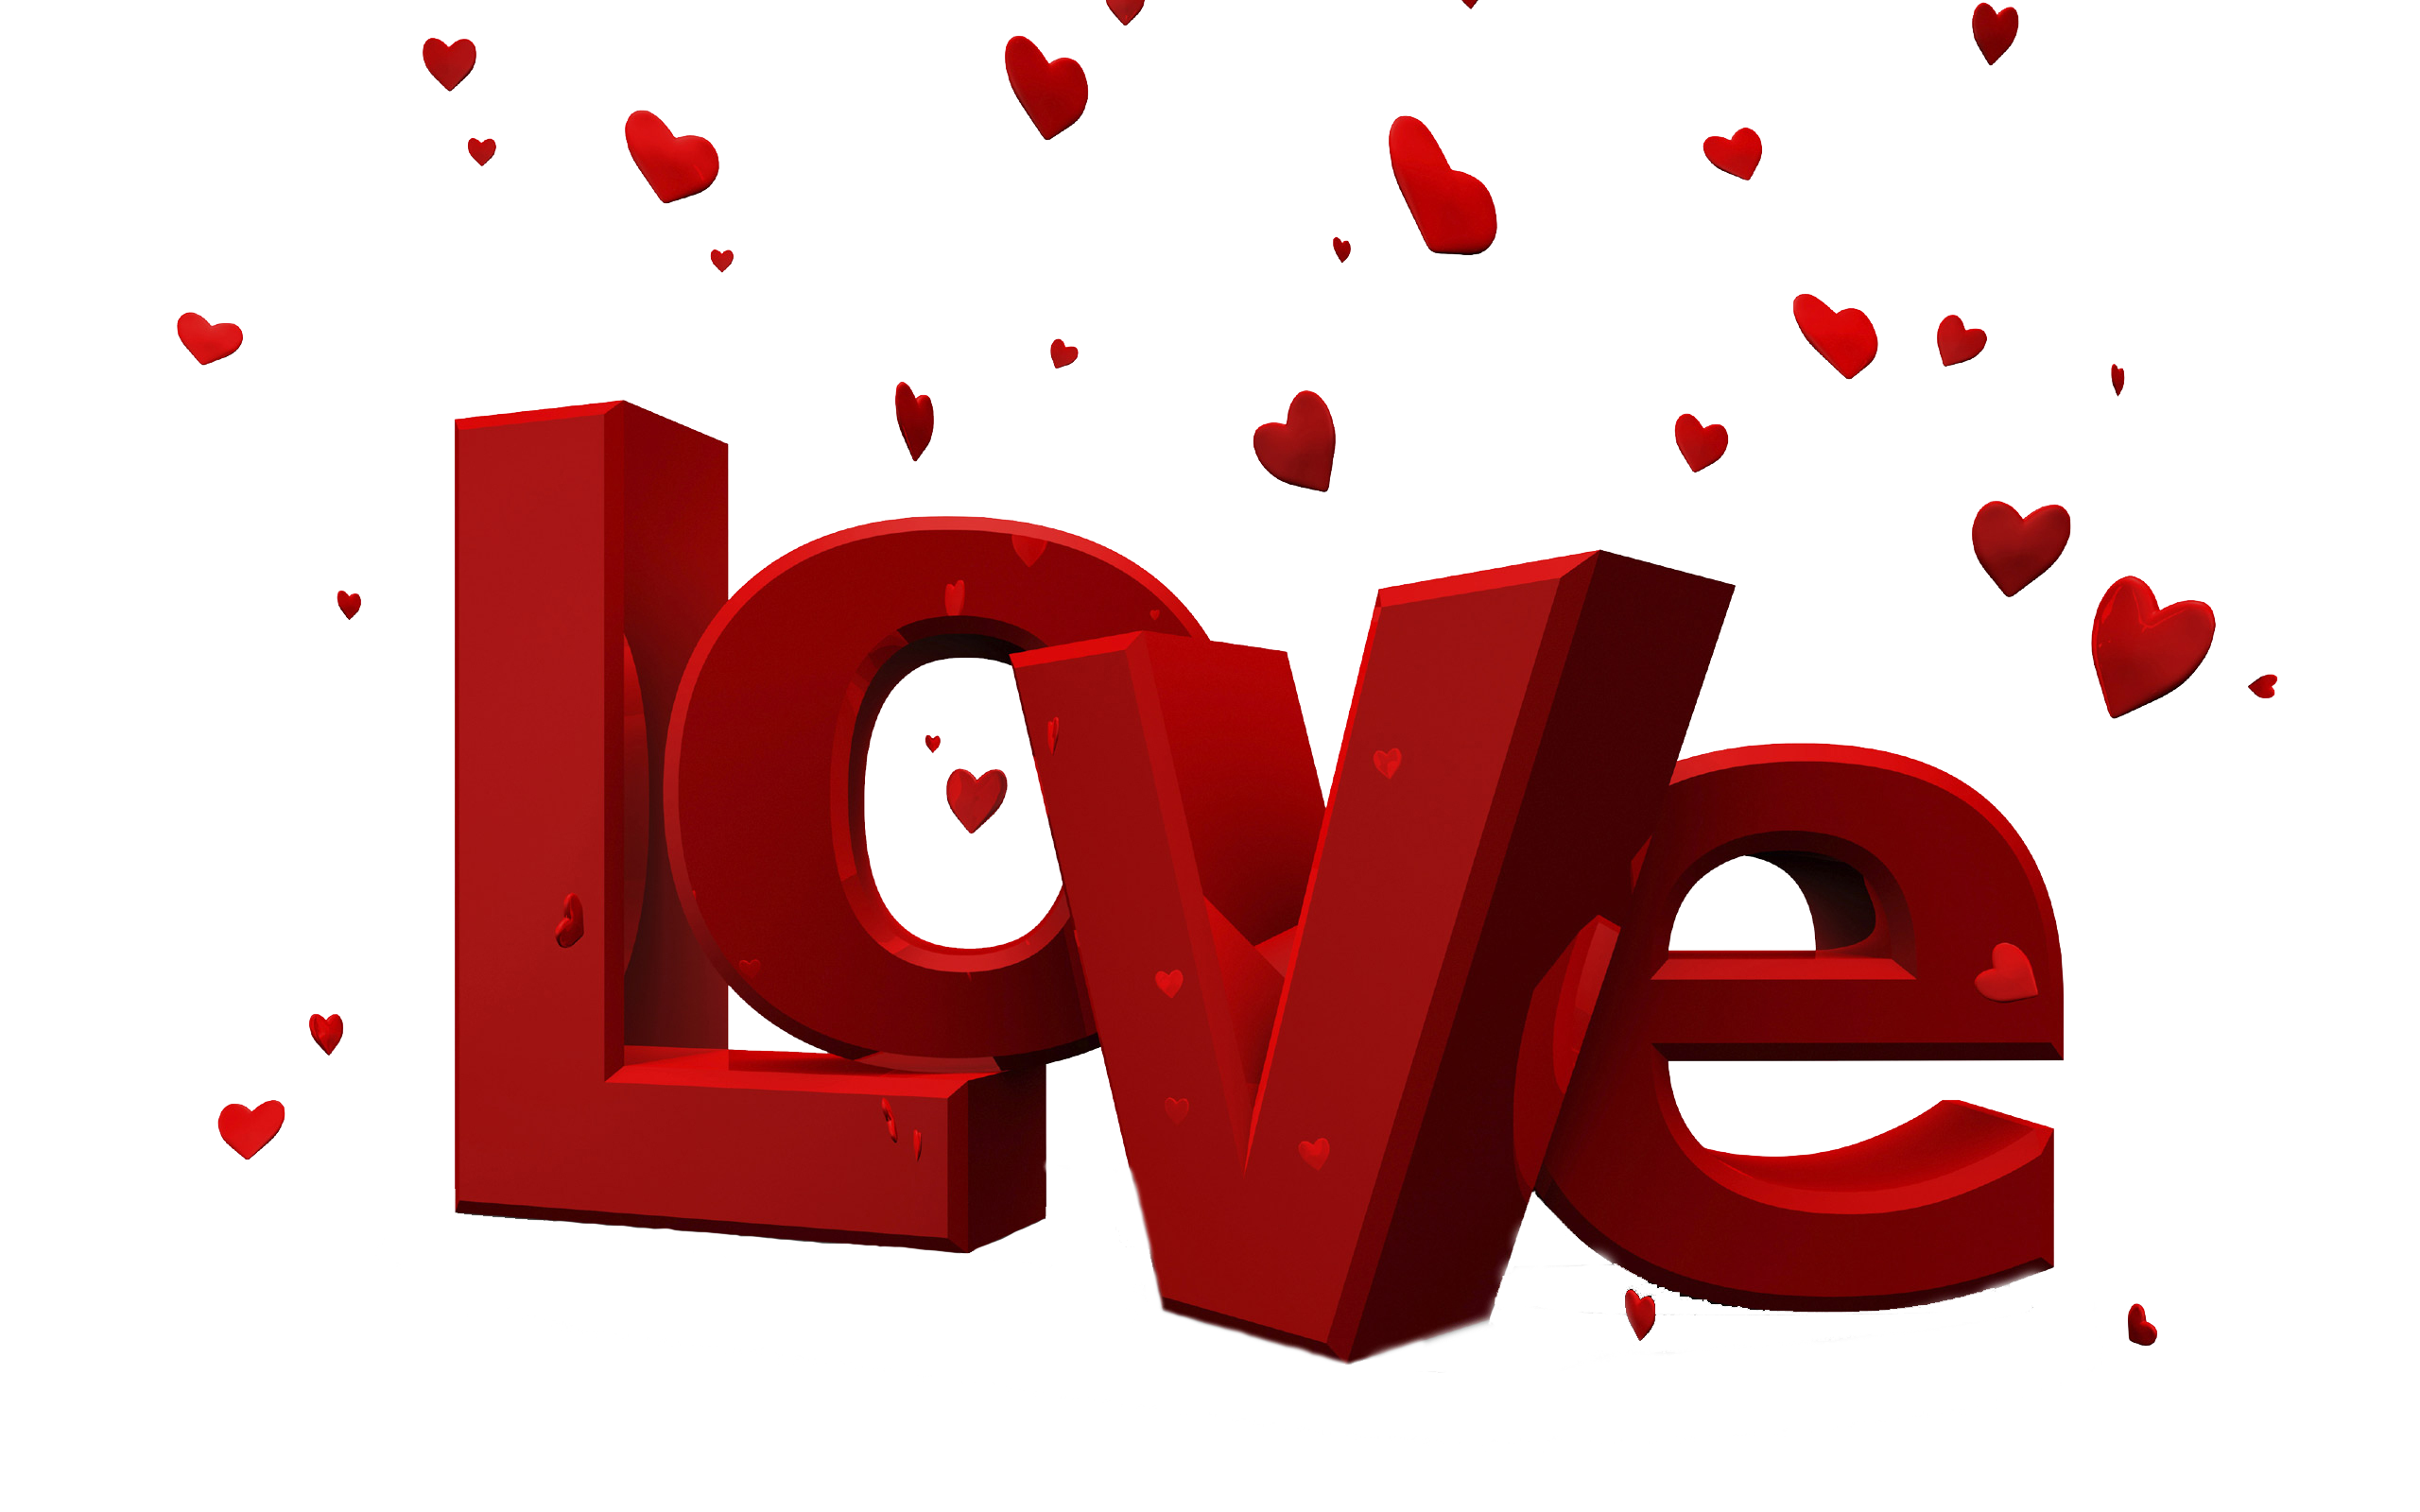 Download Love Download Png HQ PNG Image